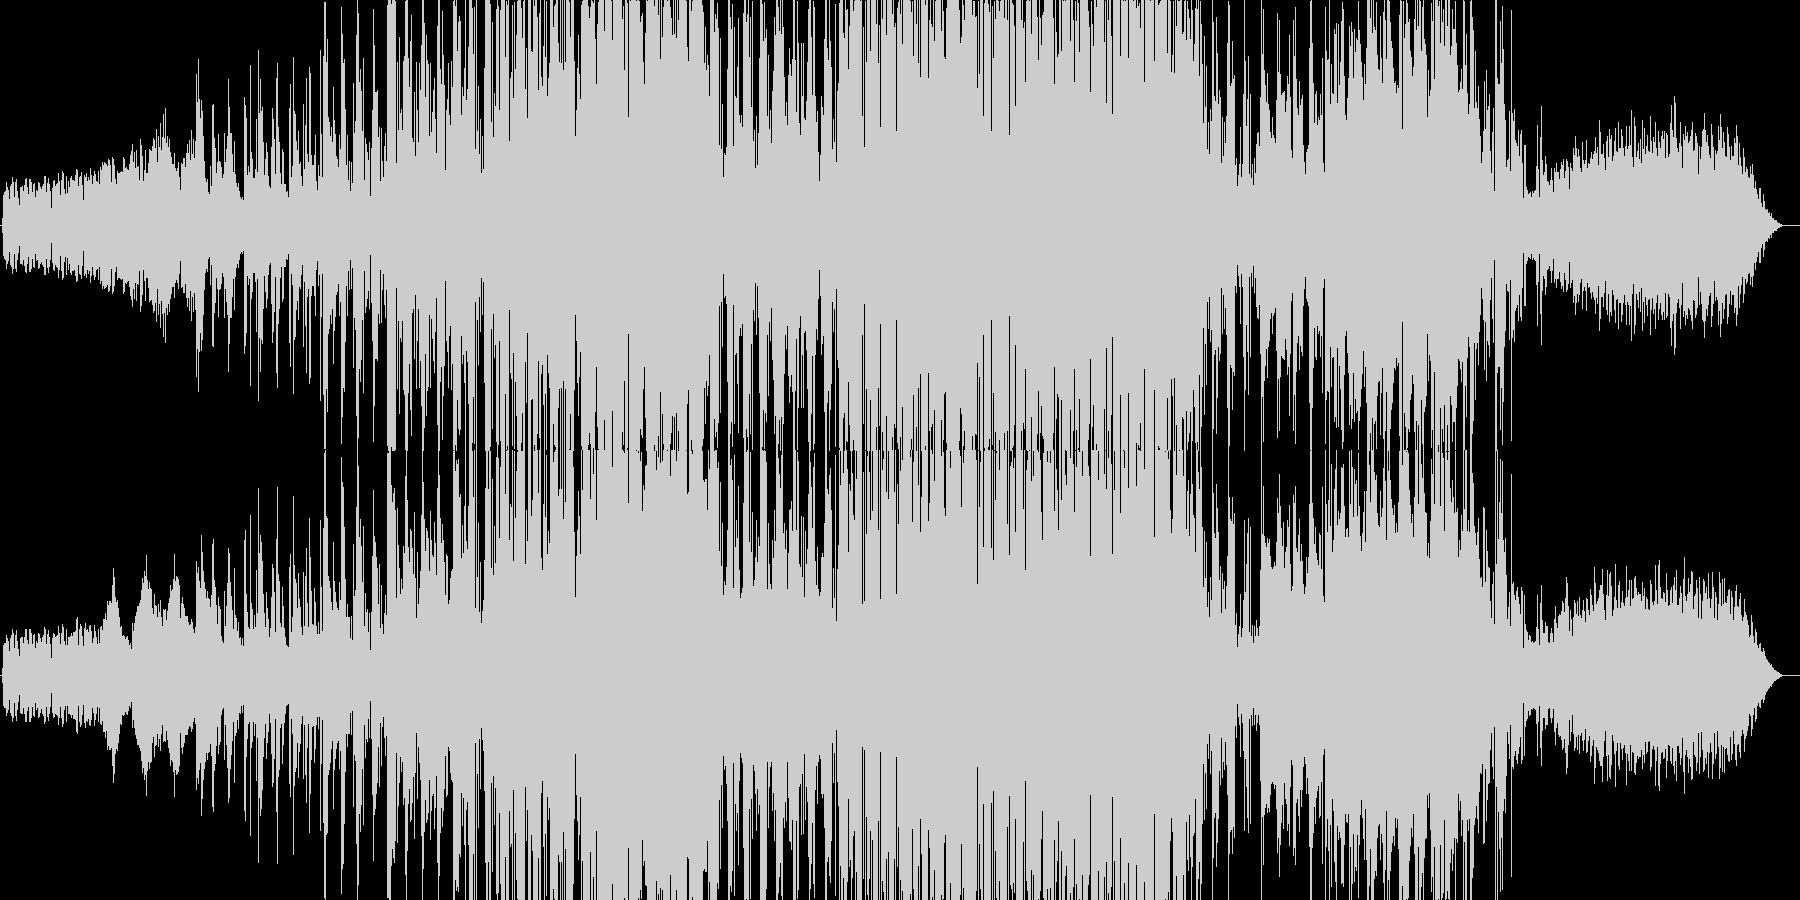 Half Step Aheadの未再生の波形